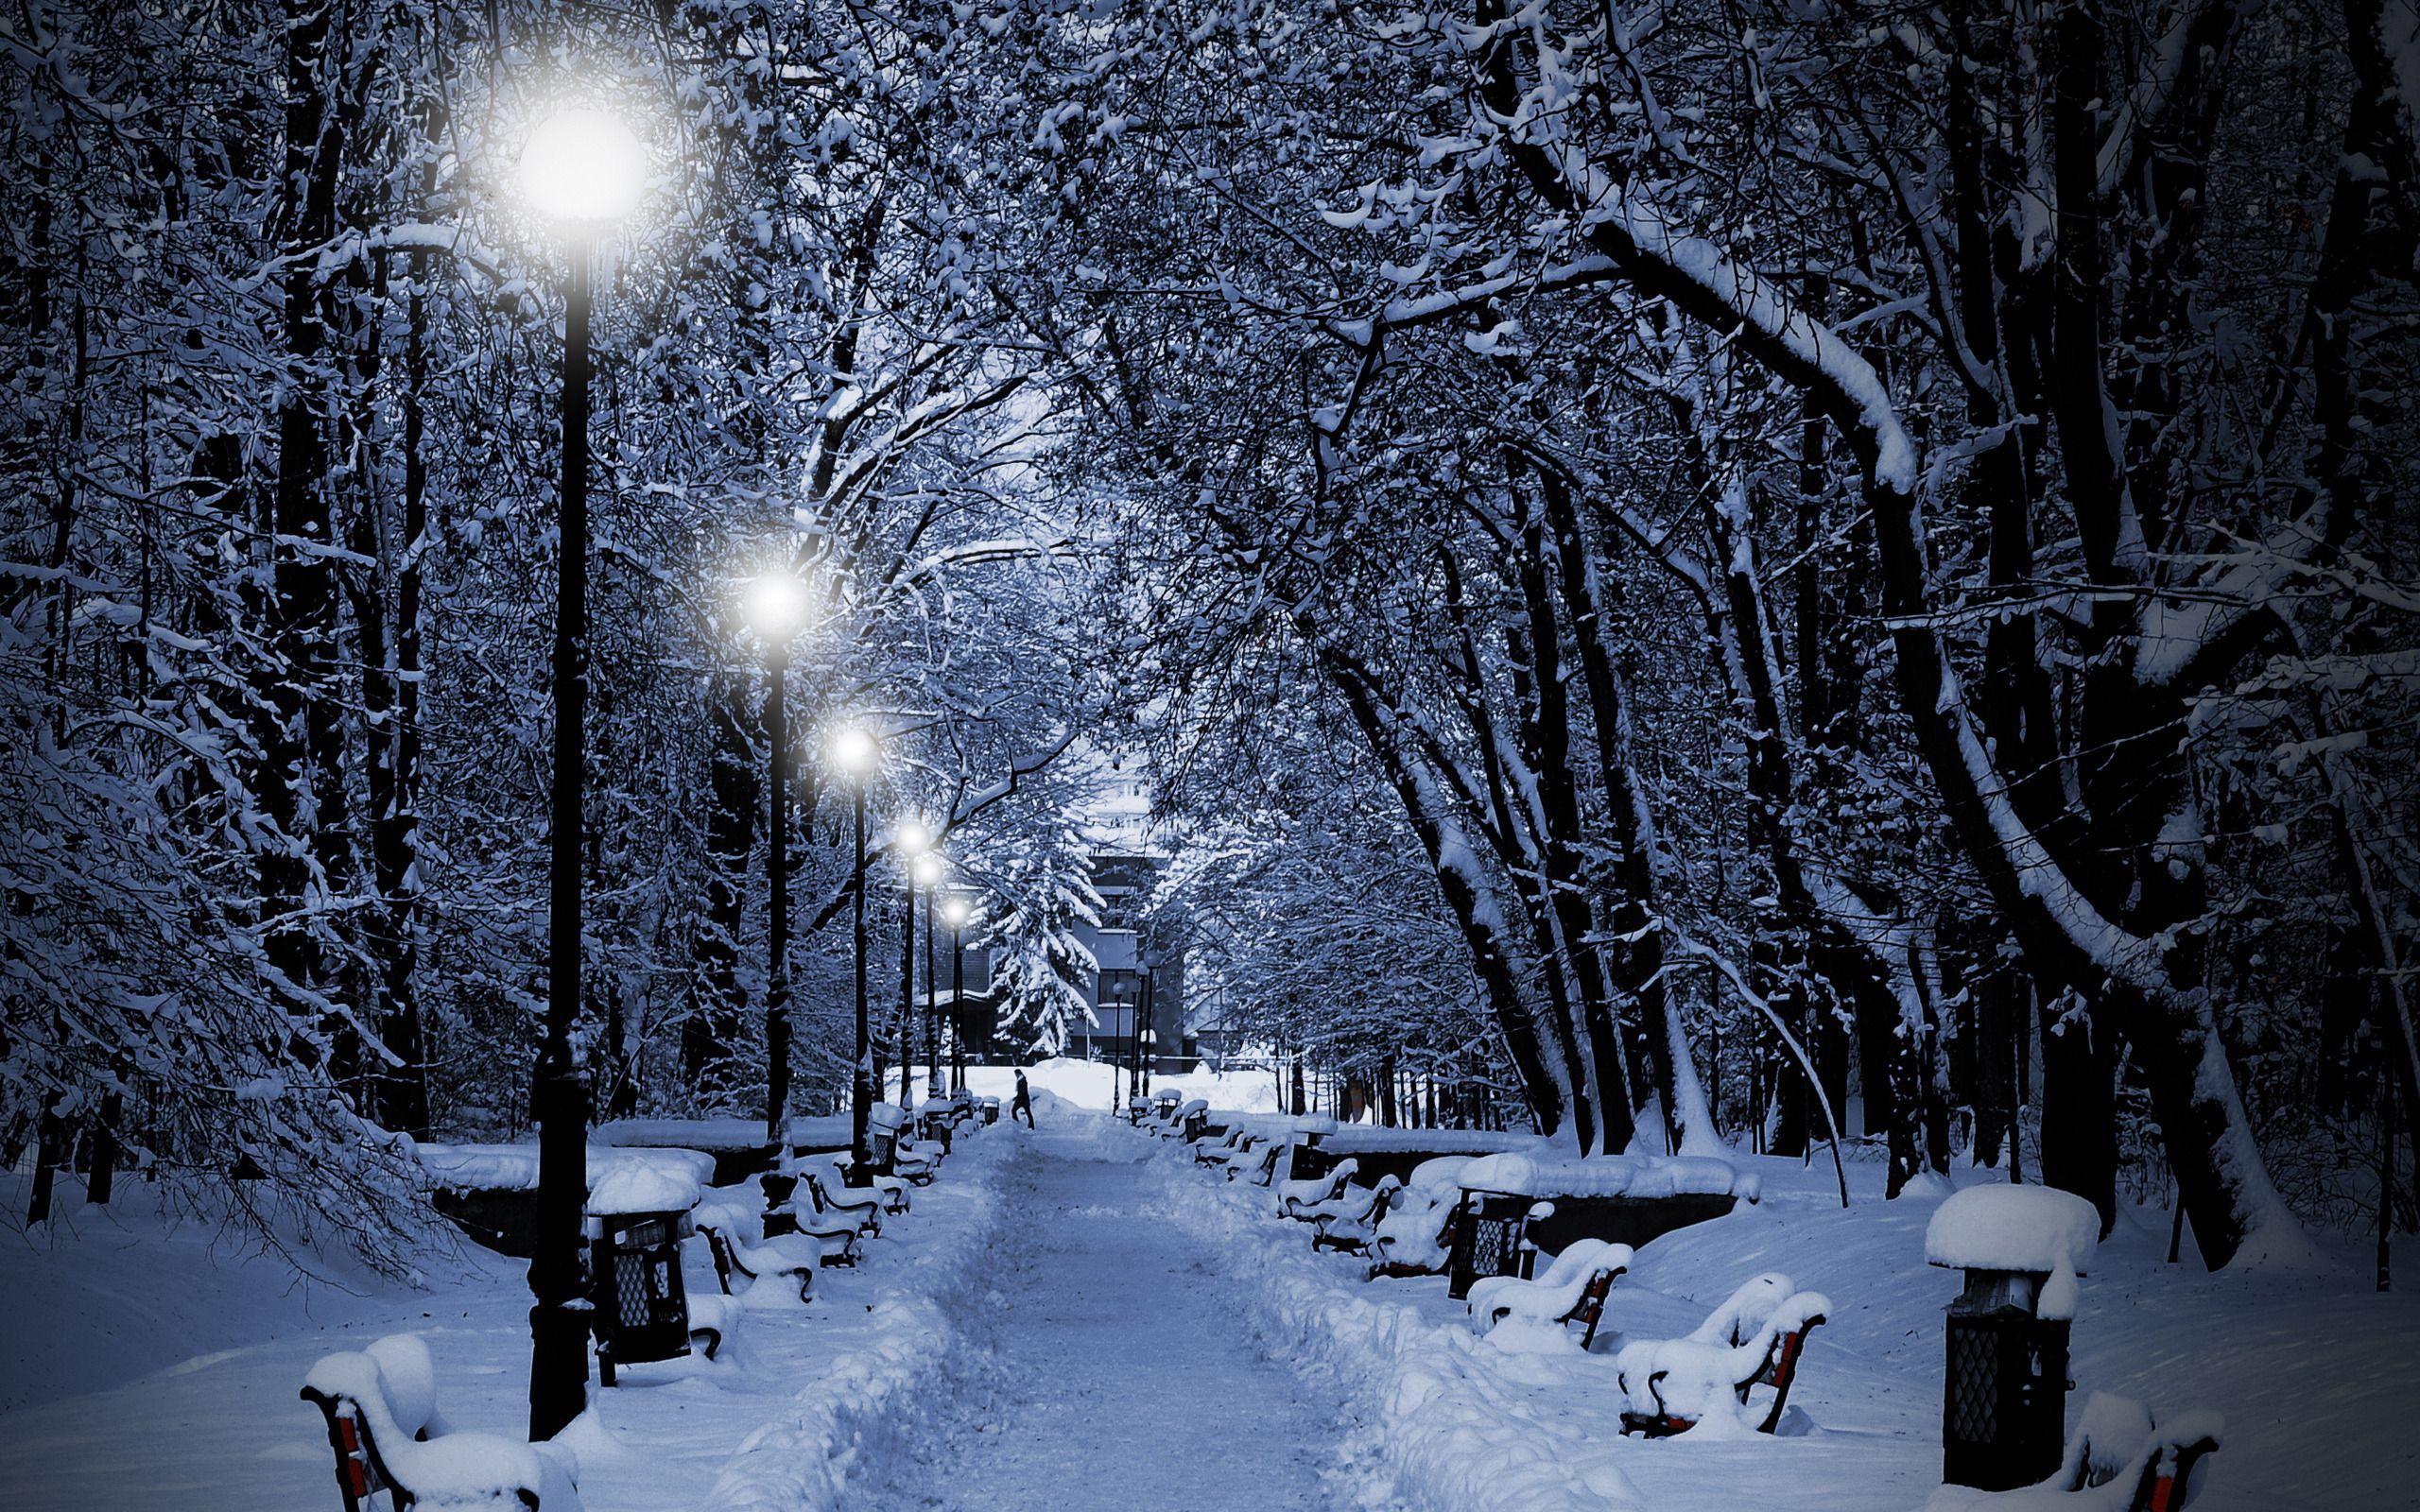 Christmas Snow Tumblr Hd Wallpaper.